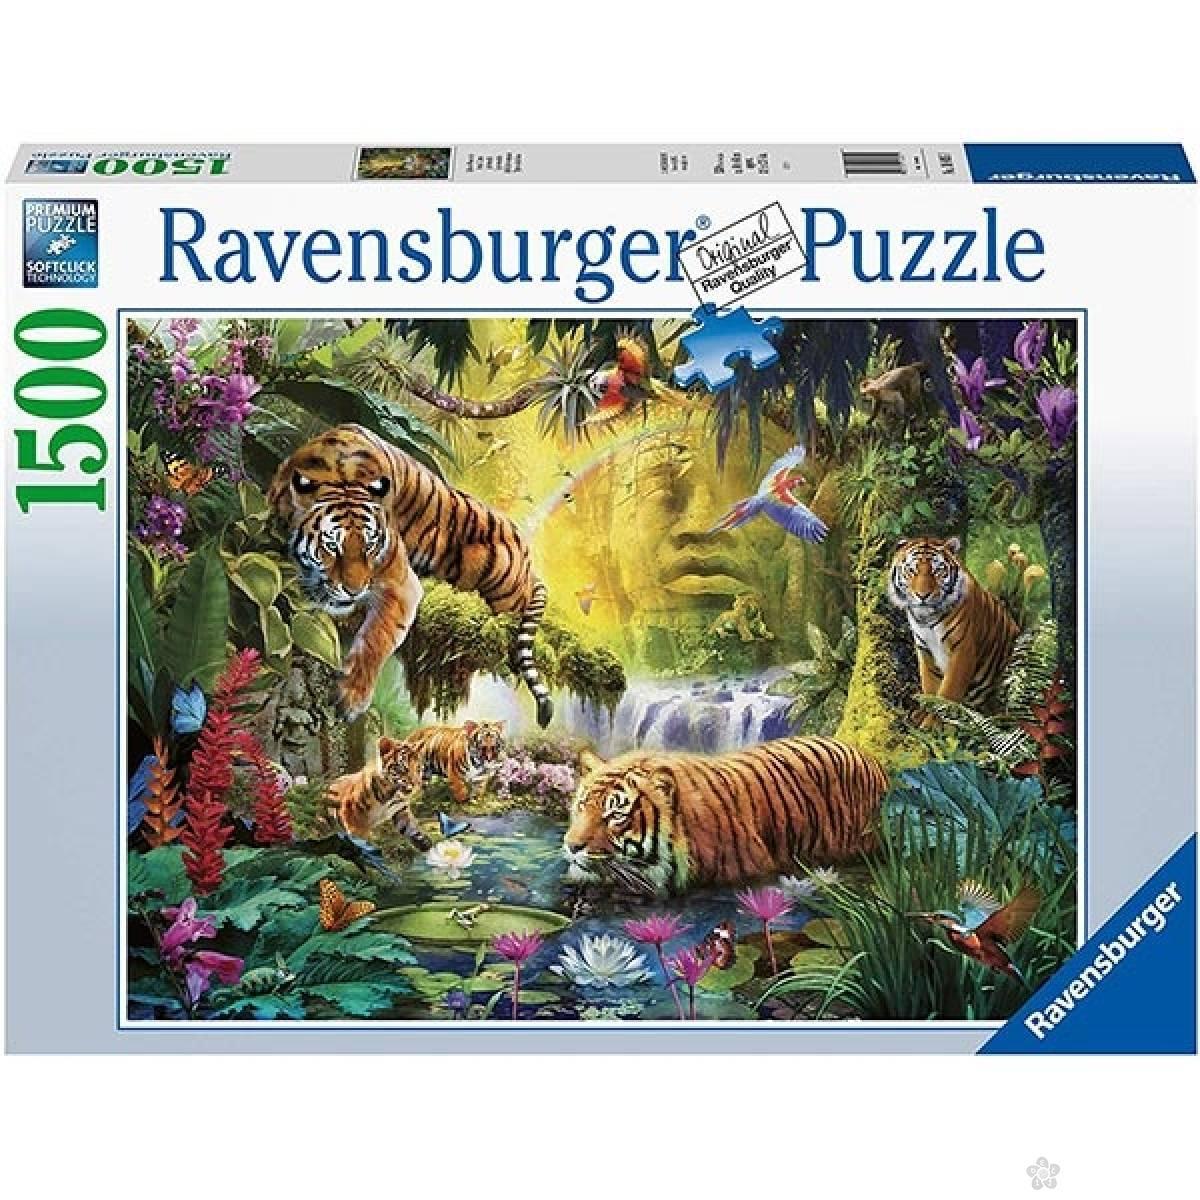 Ravensburger puzzla Tranquil Tigers RA16005